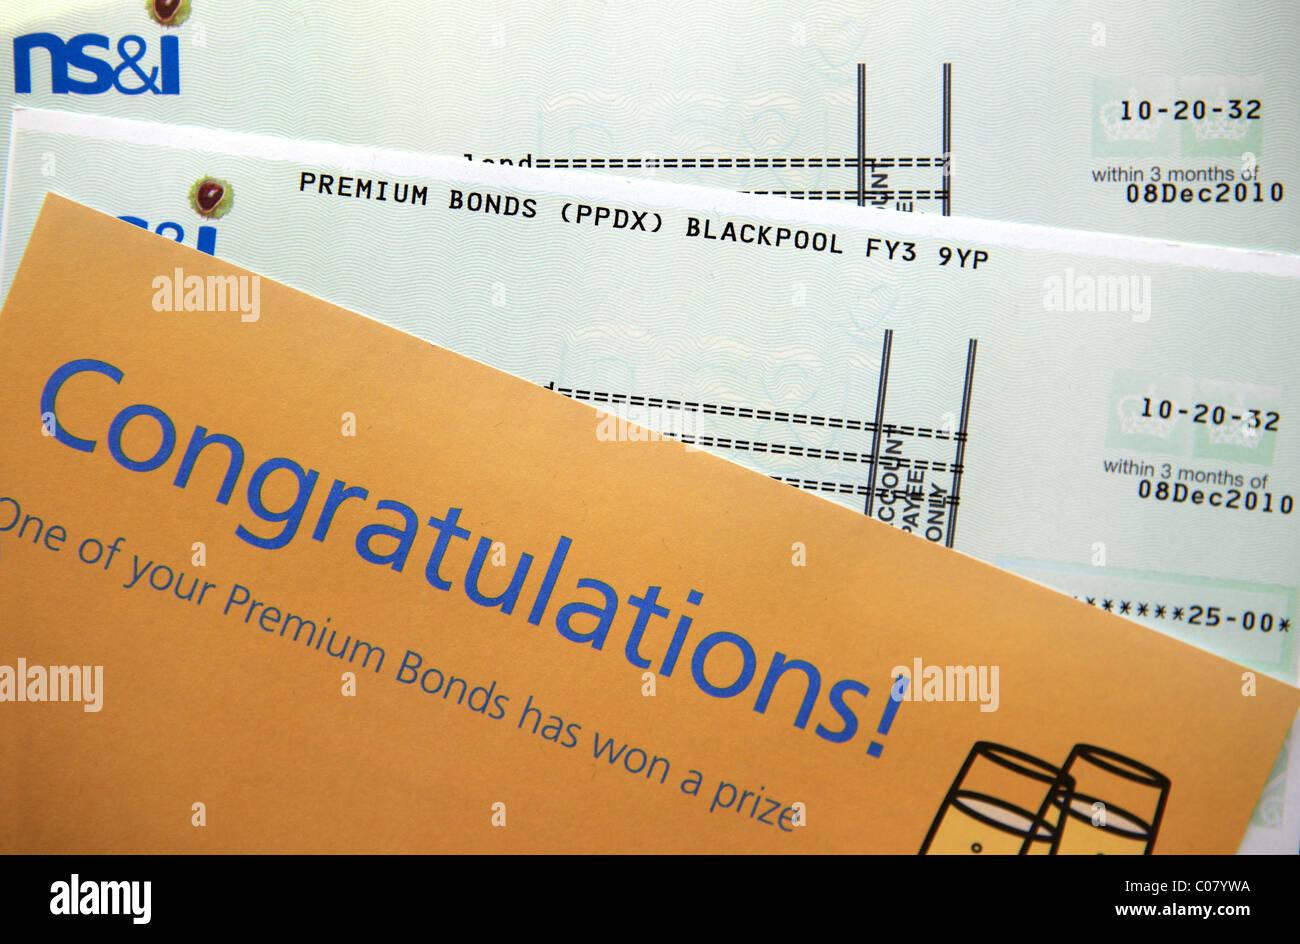 Premium bond wins Stock Photo